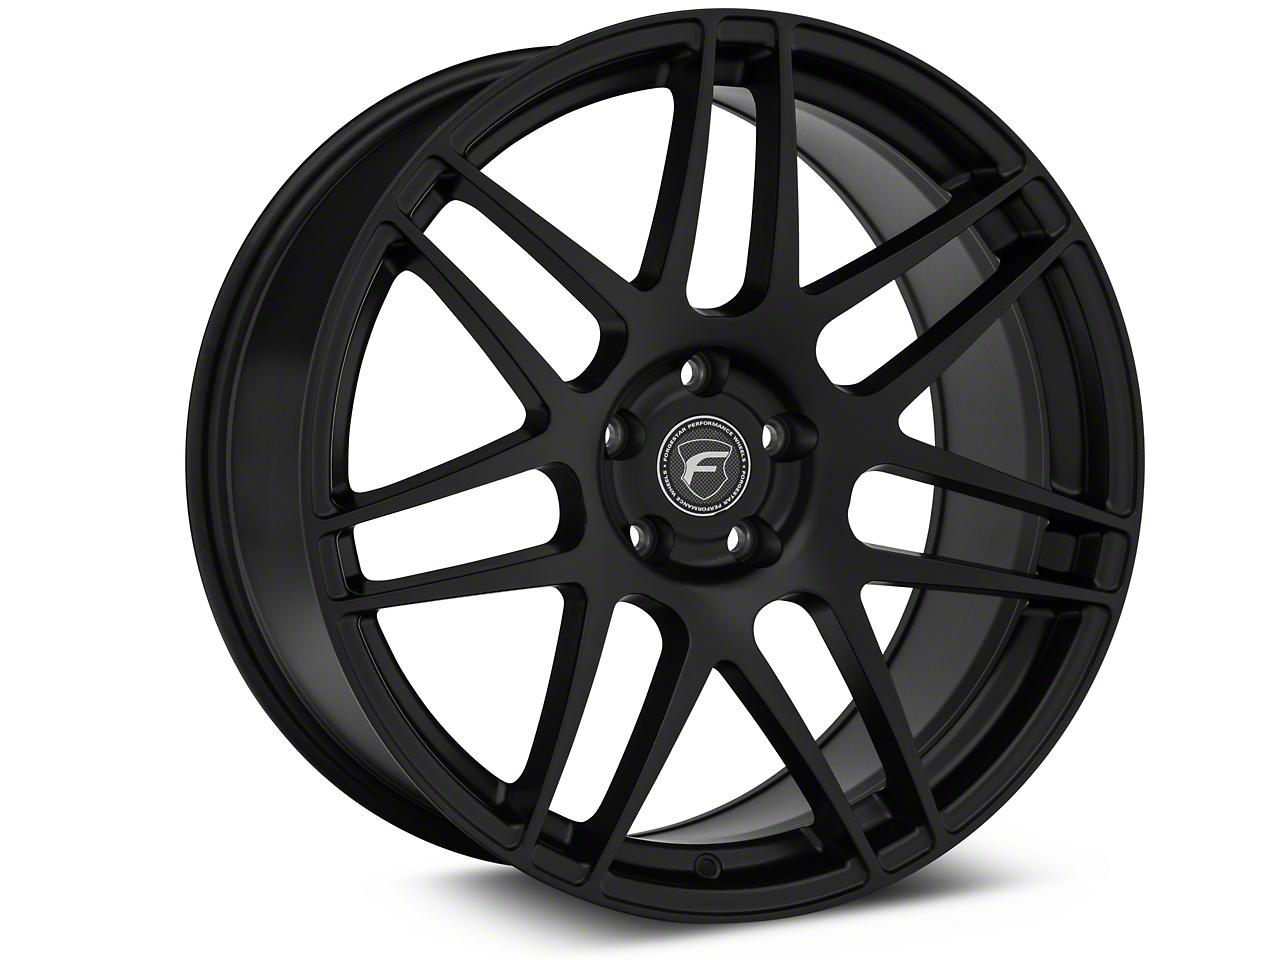 Forgestar F14 Monoblock Matte Black Wheel - 20x9.5 (05-14 All)